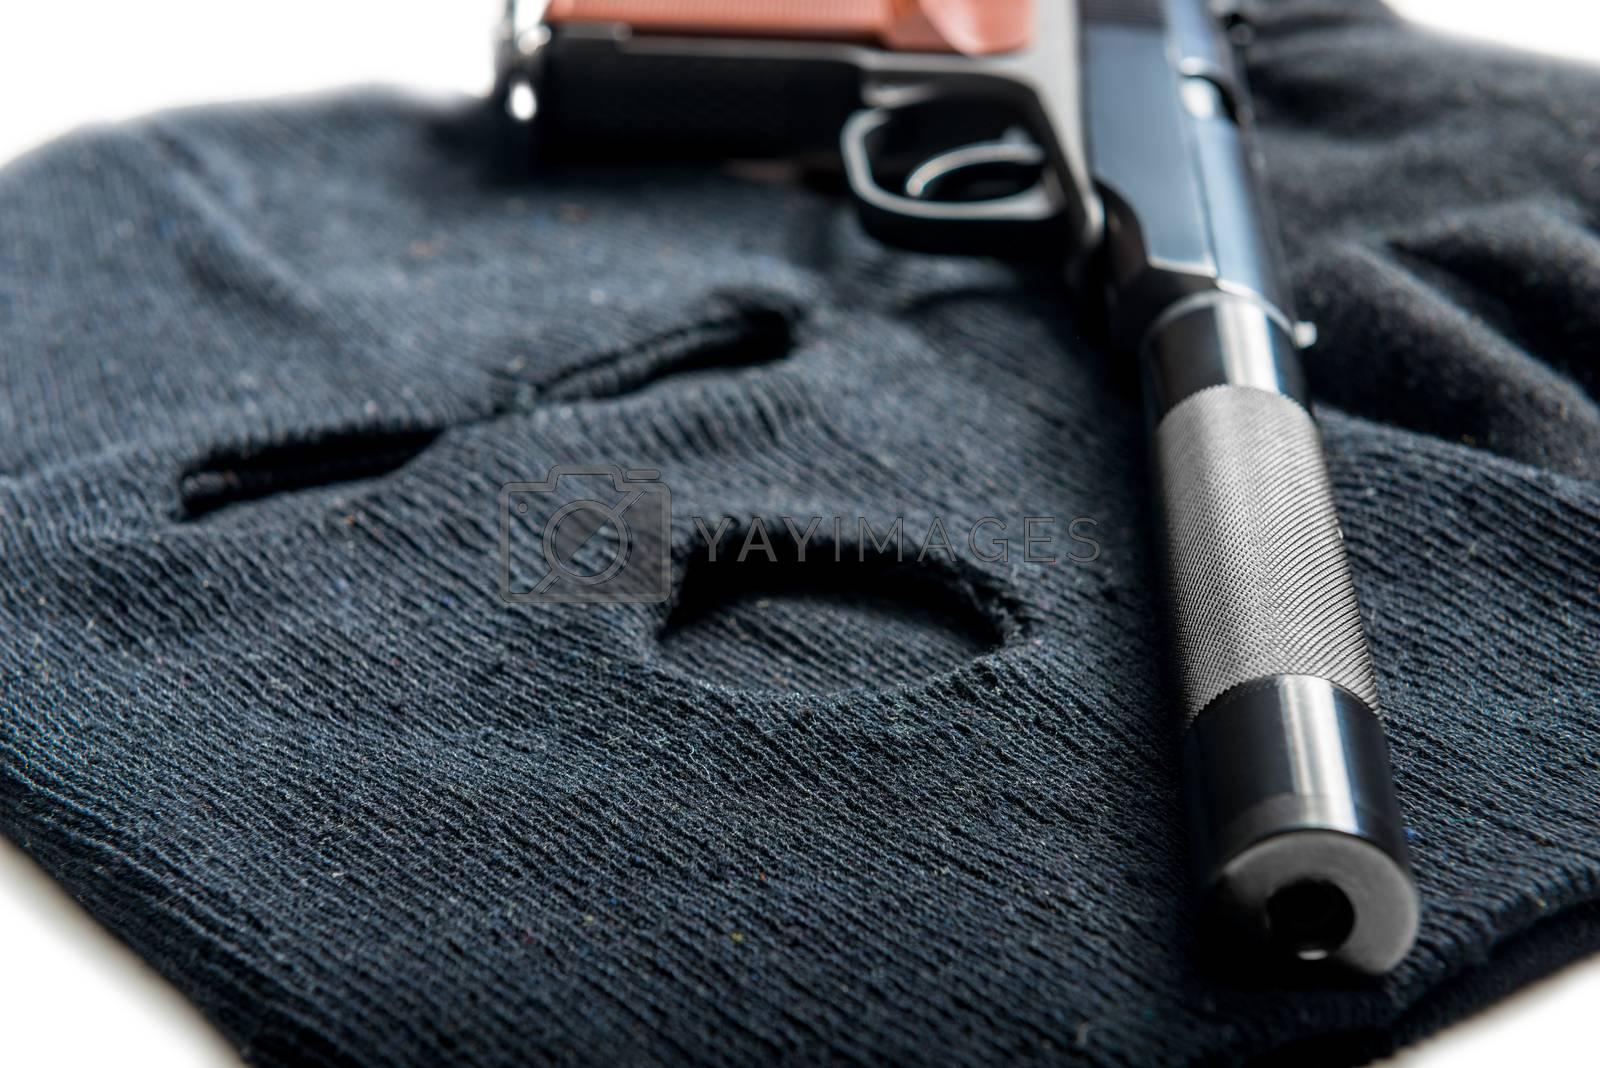 black mask balaclava and gun close up on a white table by Labunskiy K.